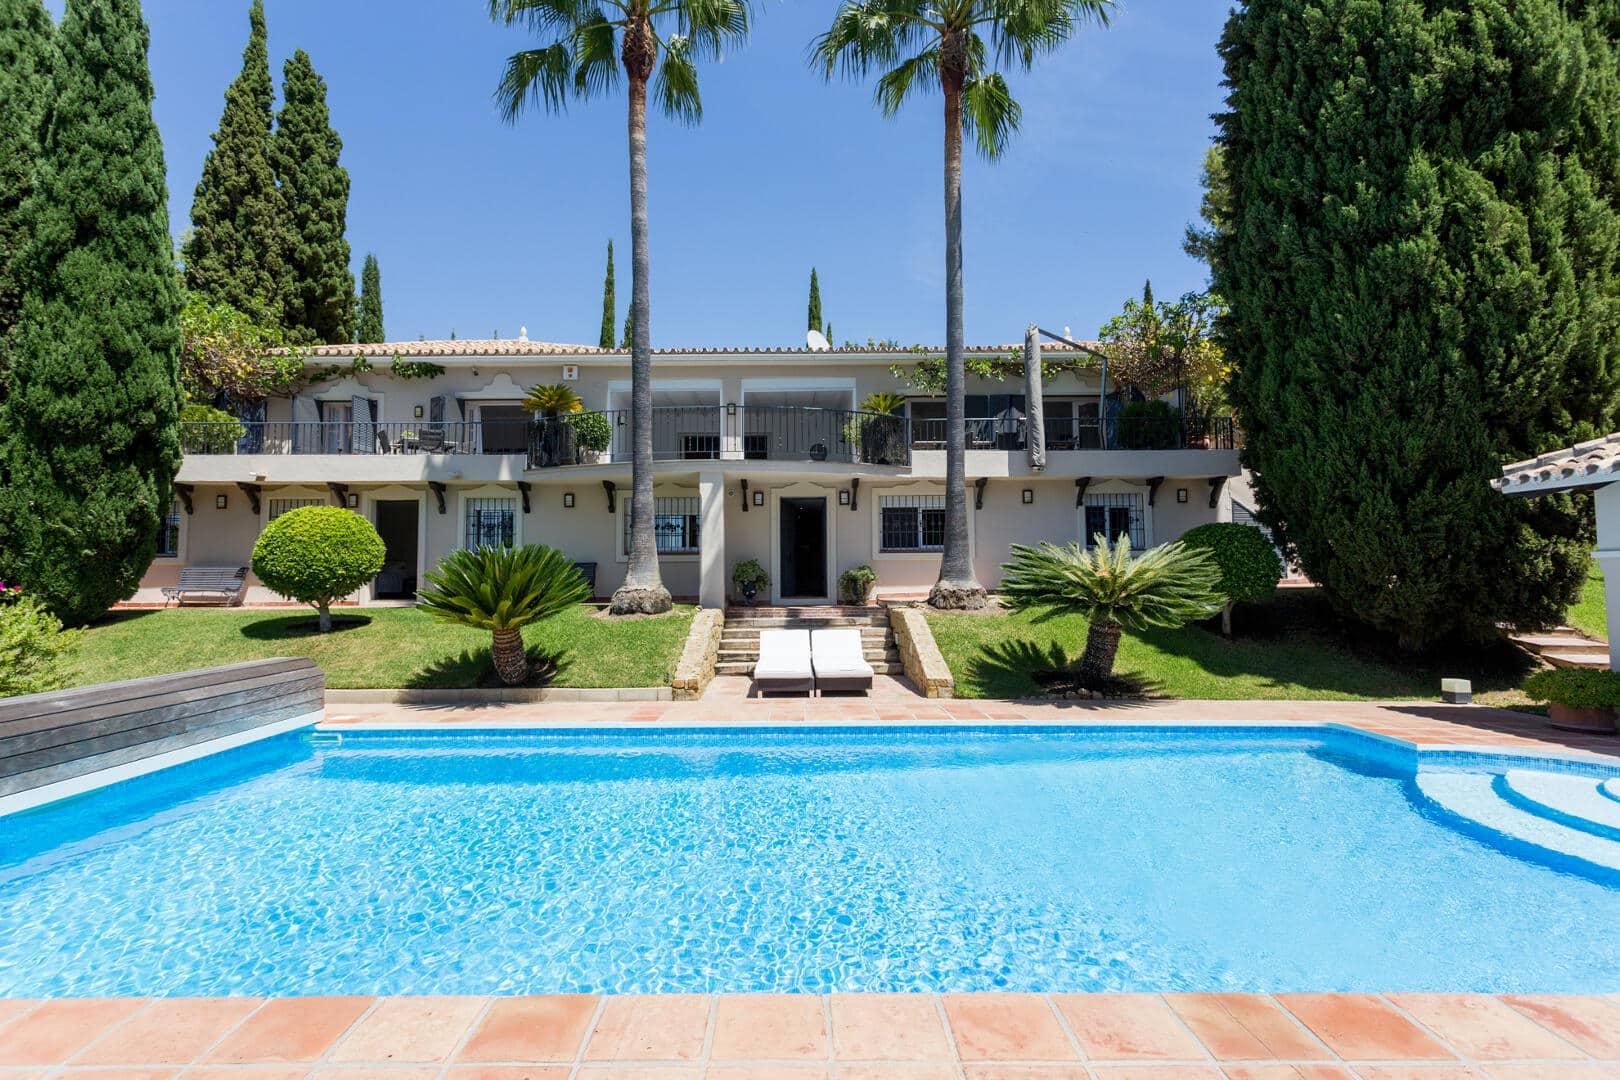 Beautiful private 5 bedroom Villa in Puerto de los Almendros gated community in Benahavis municipality